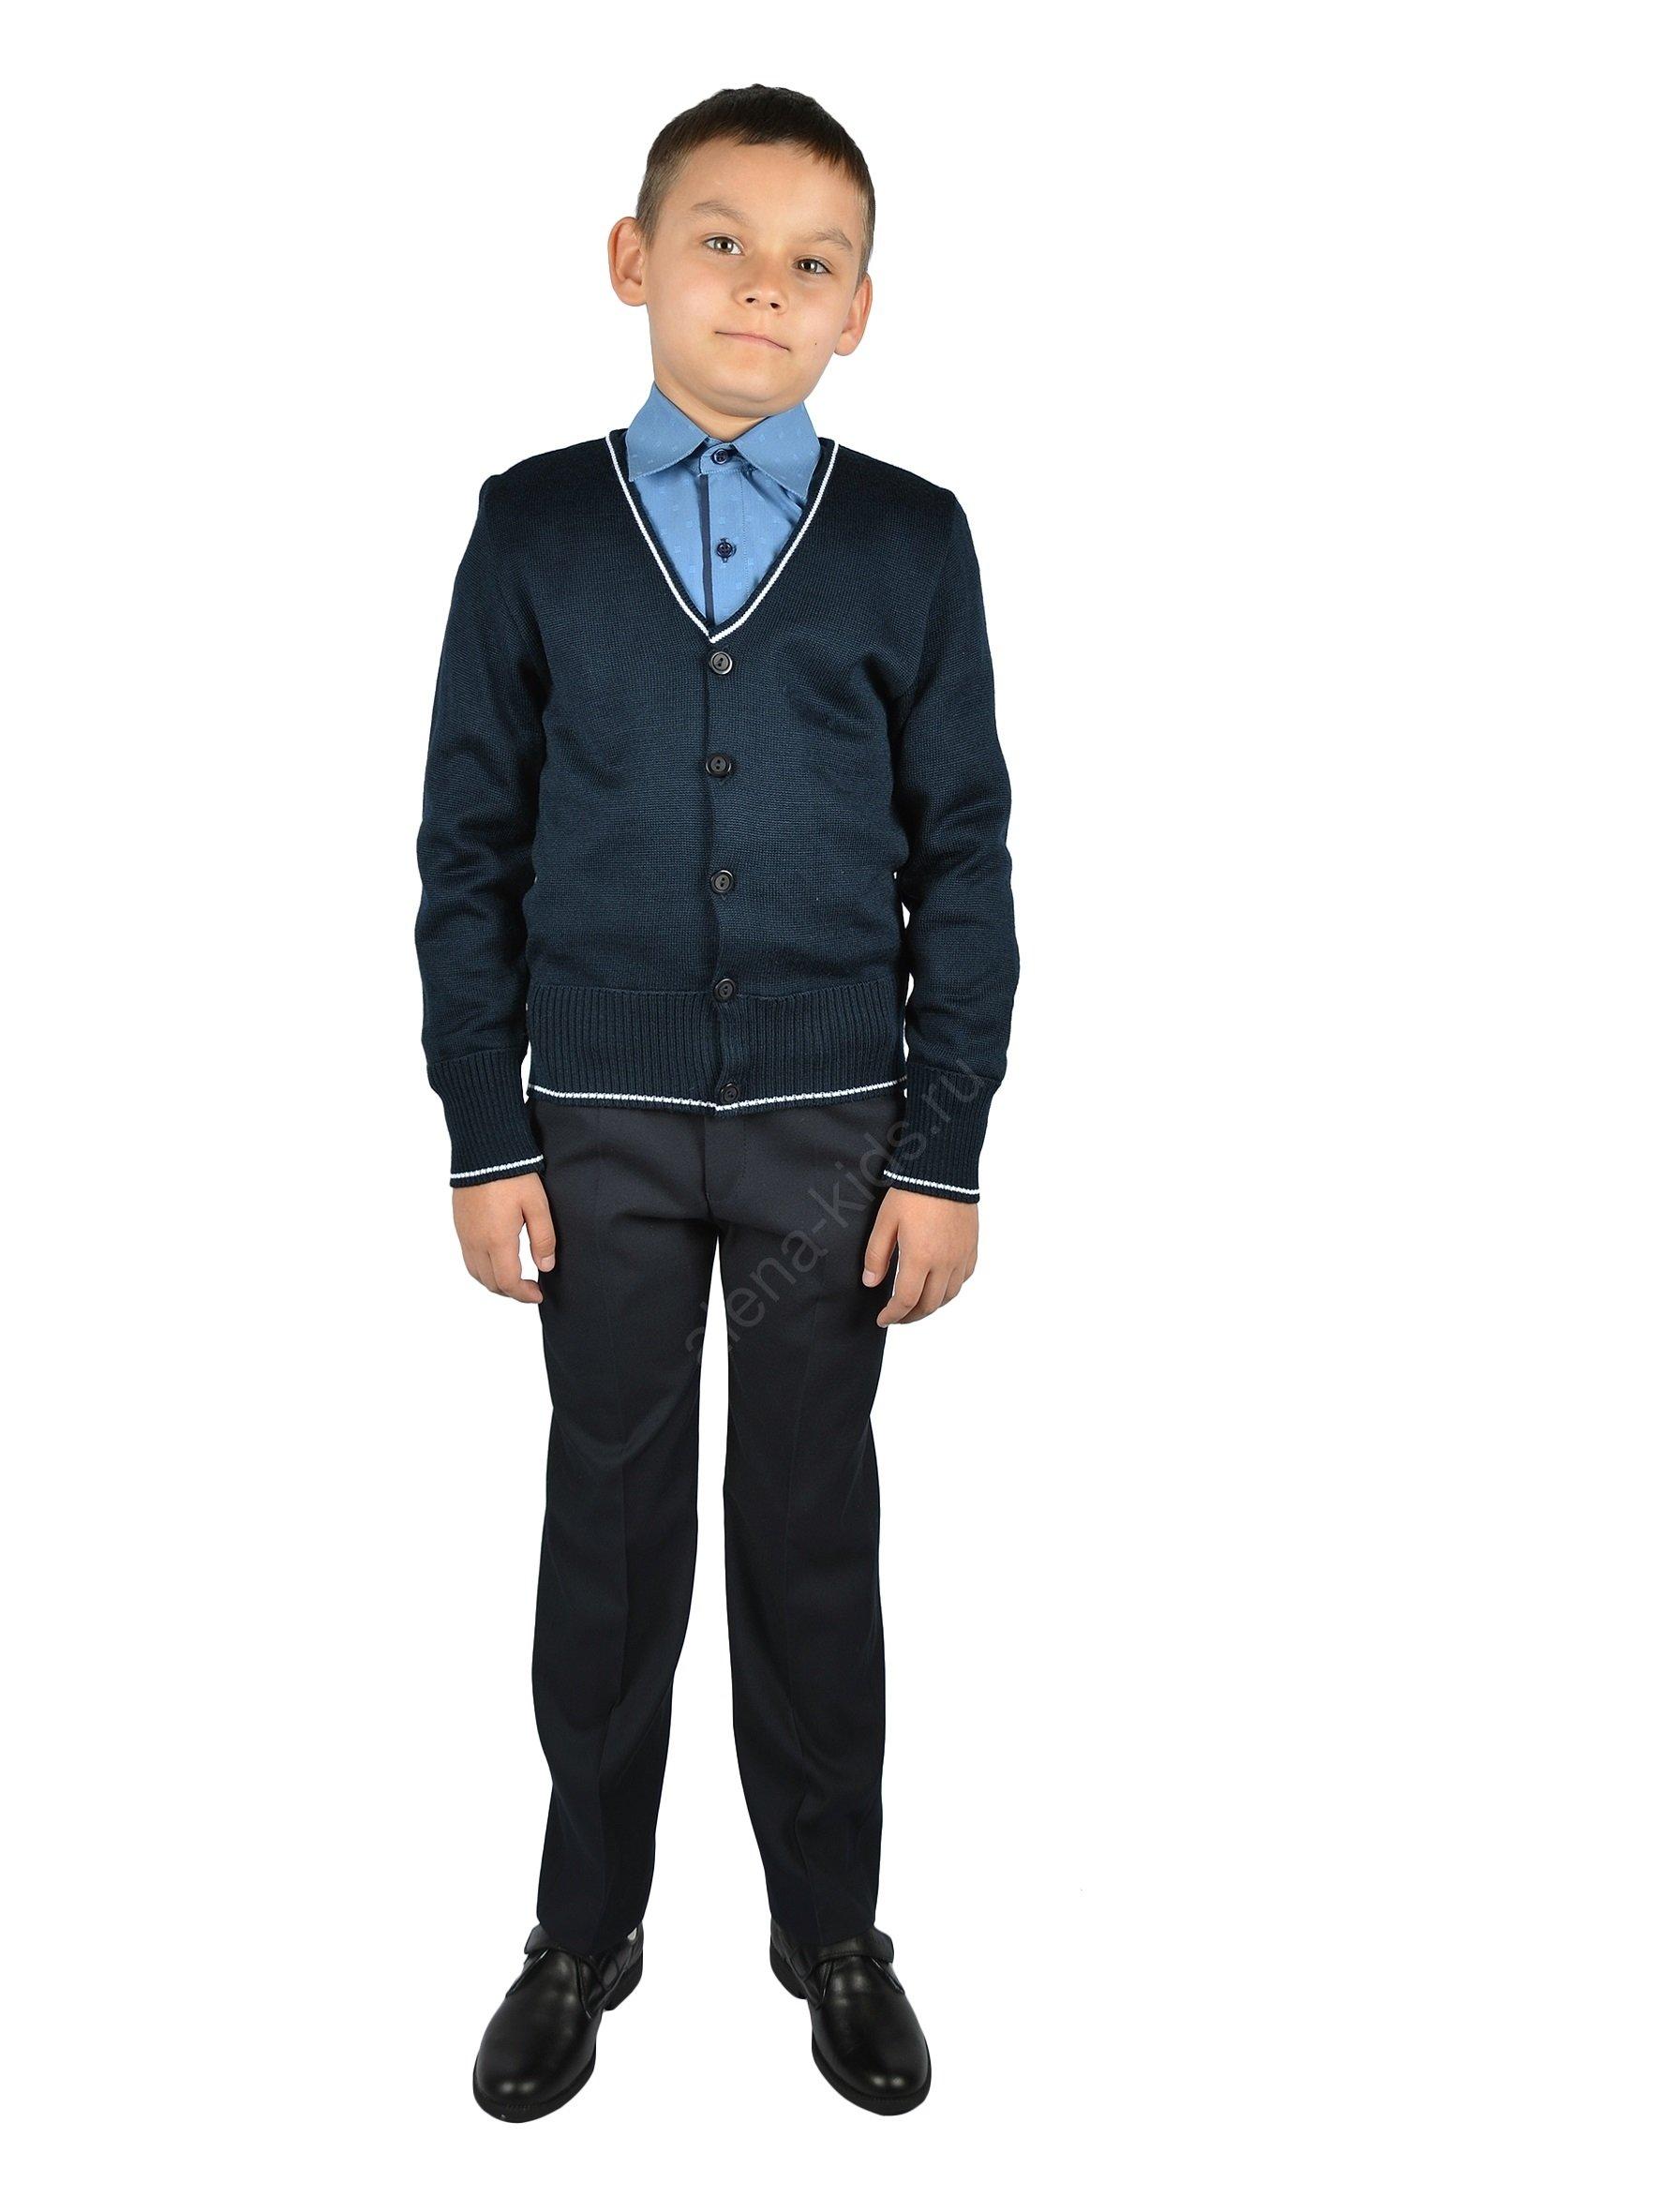 Жакет для мальчика YSTT-ЖКД-3син